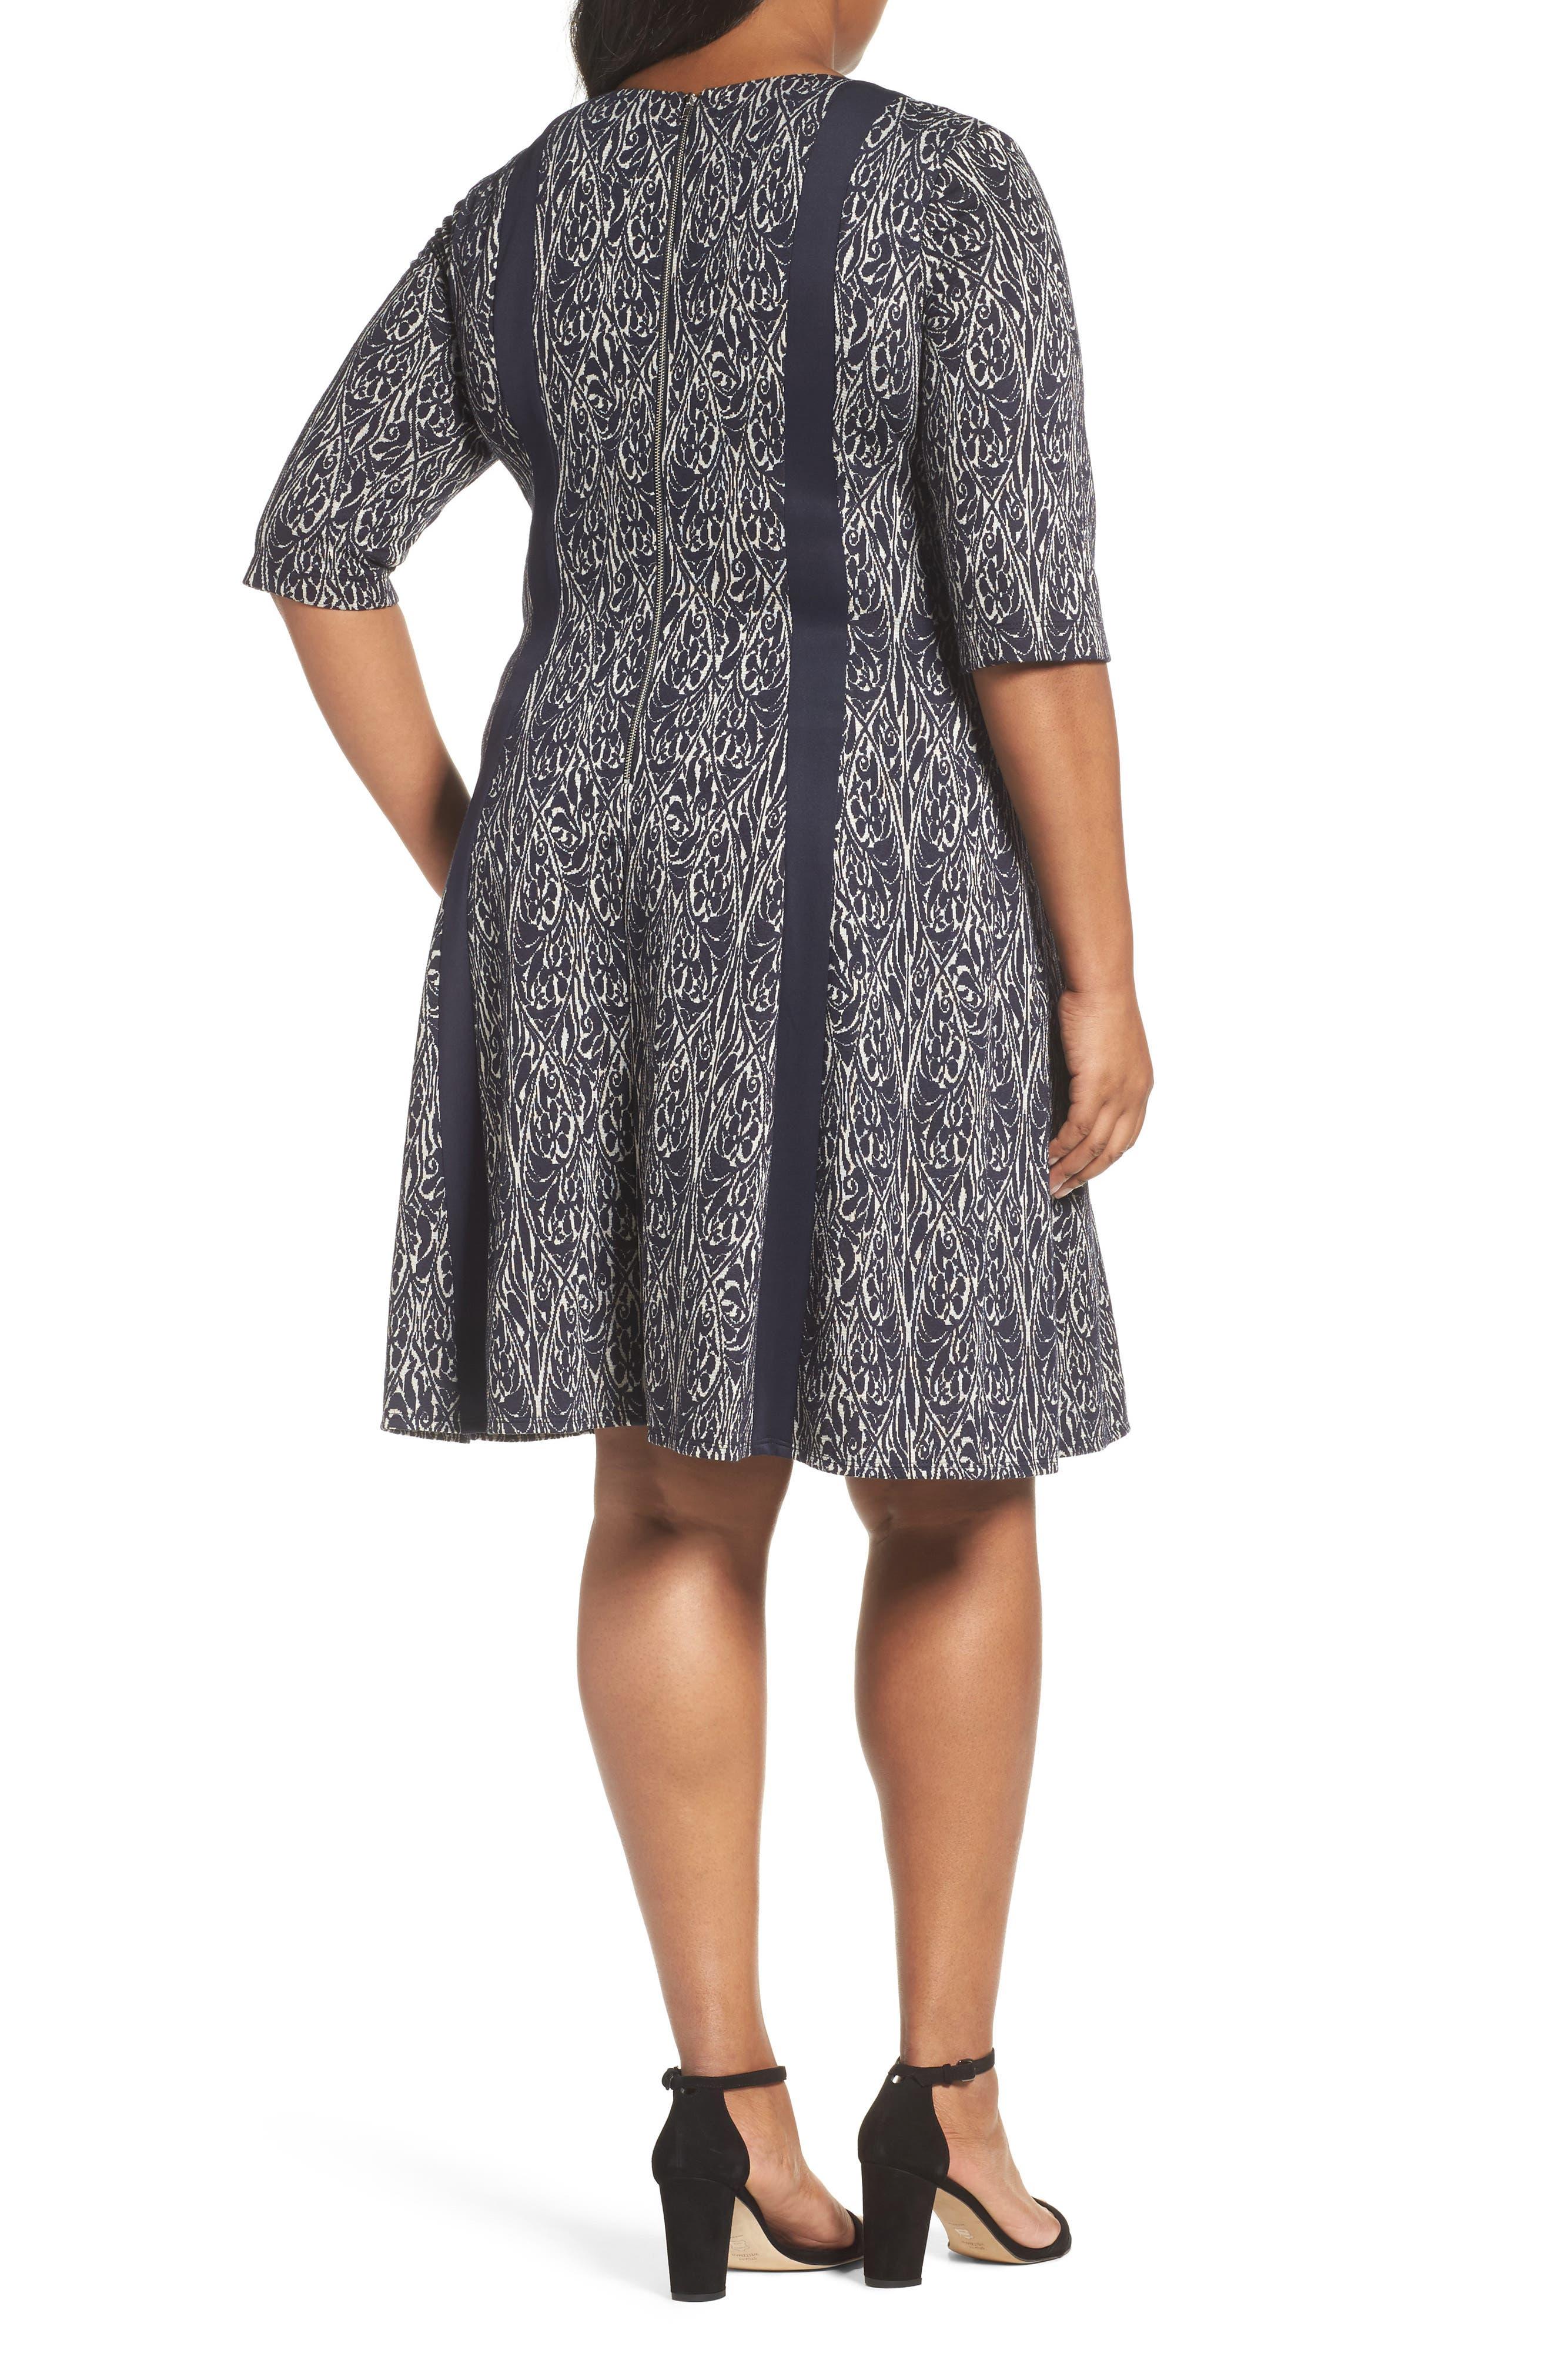 Jacquard Knit A-Line Dress,                             Alternate thumbnail 2, color,                             Navy/ Ivory